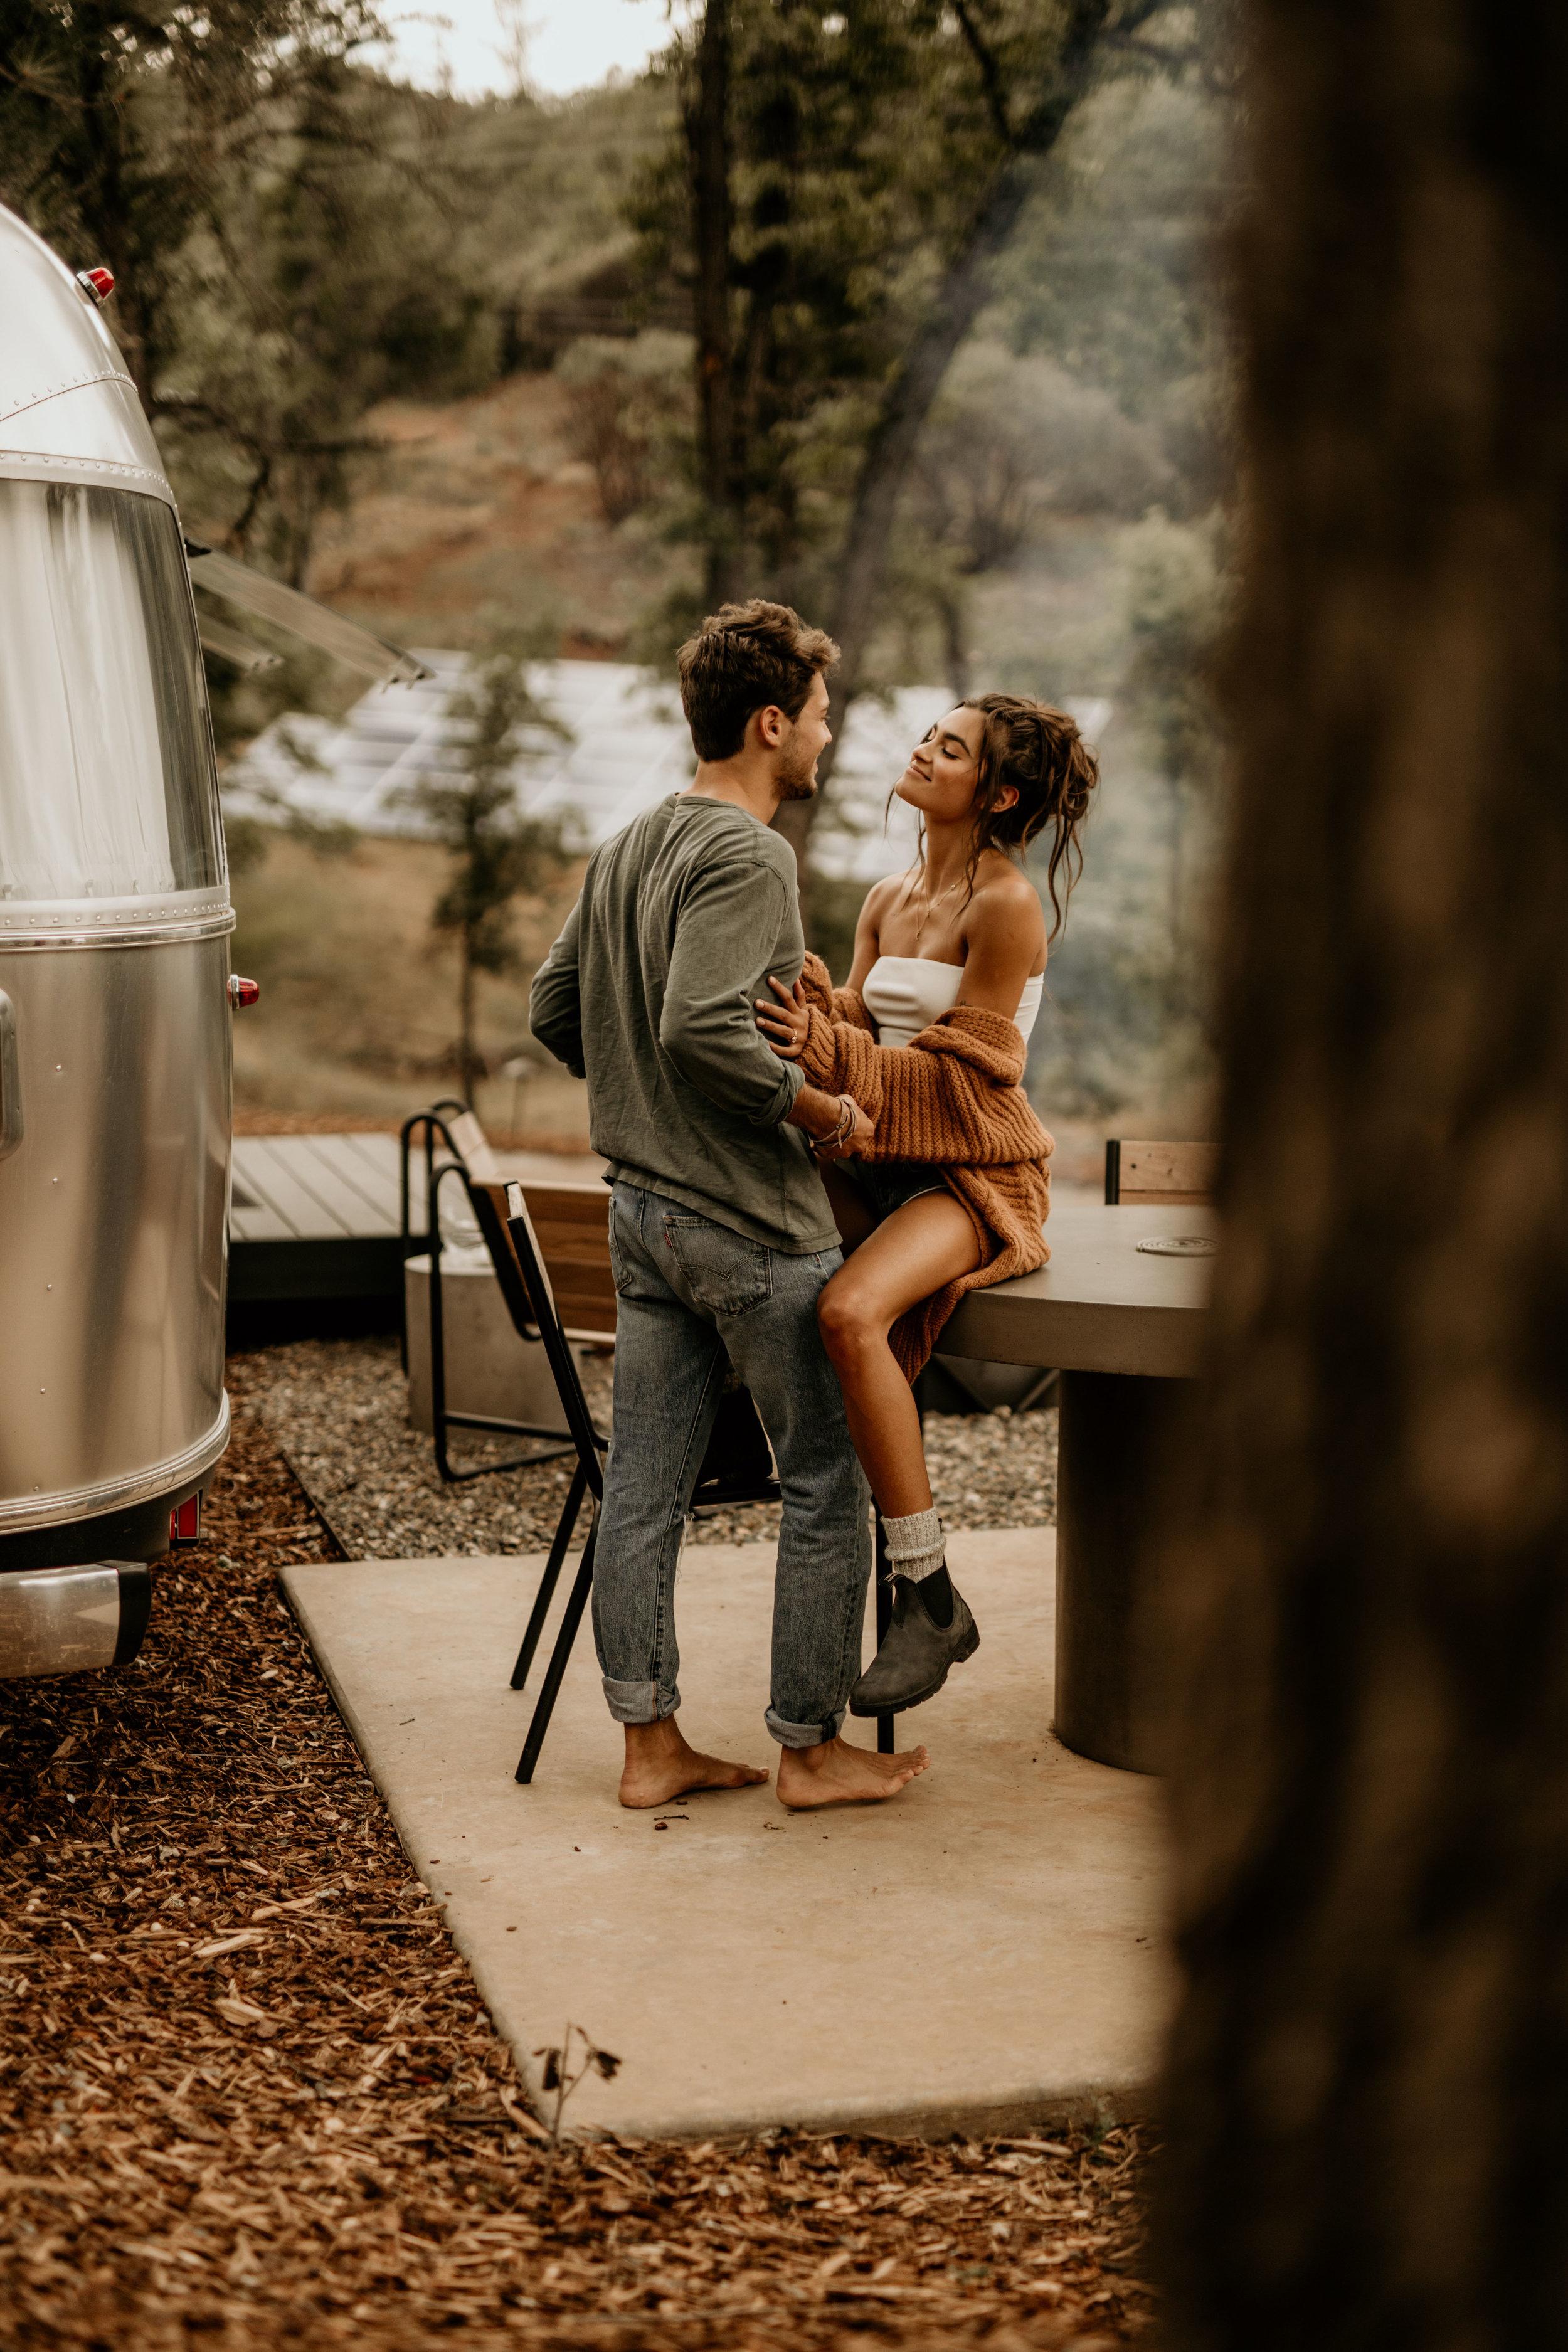 couples-engagement-outdoor-tatoo-photoshoot-little-rock-arkansas-6384.jpg